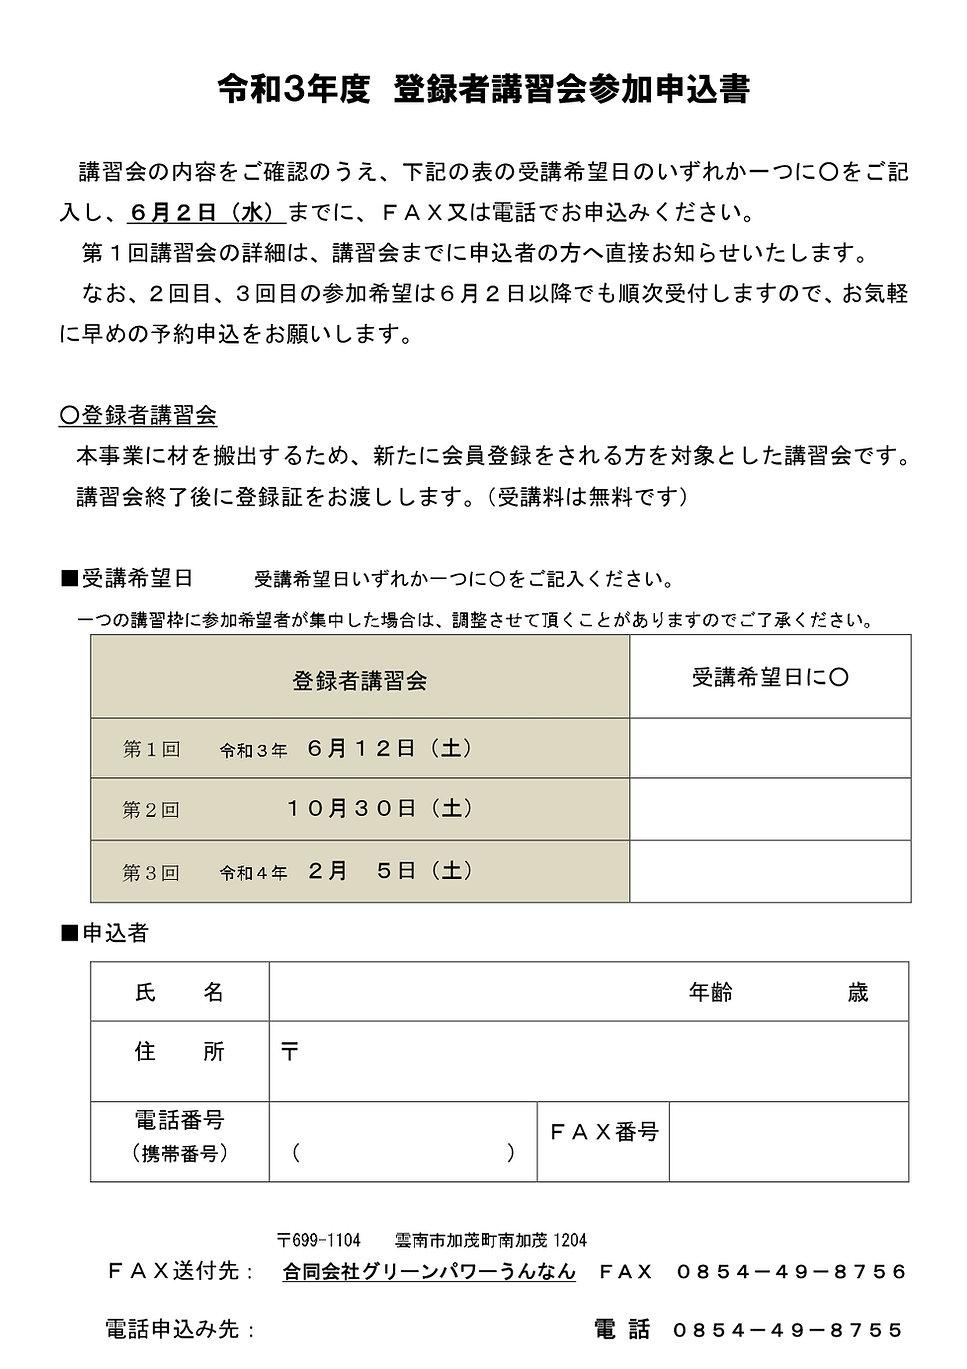 R3年度登録者講習案内(市民向け)_page-0002.jpg